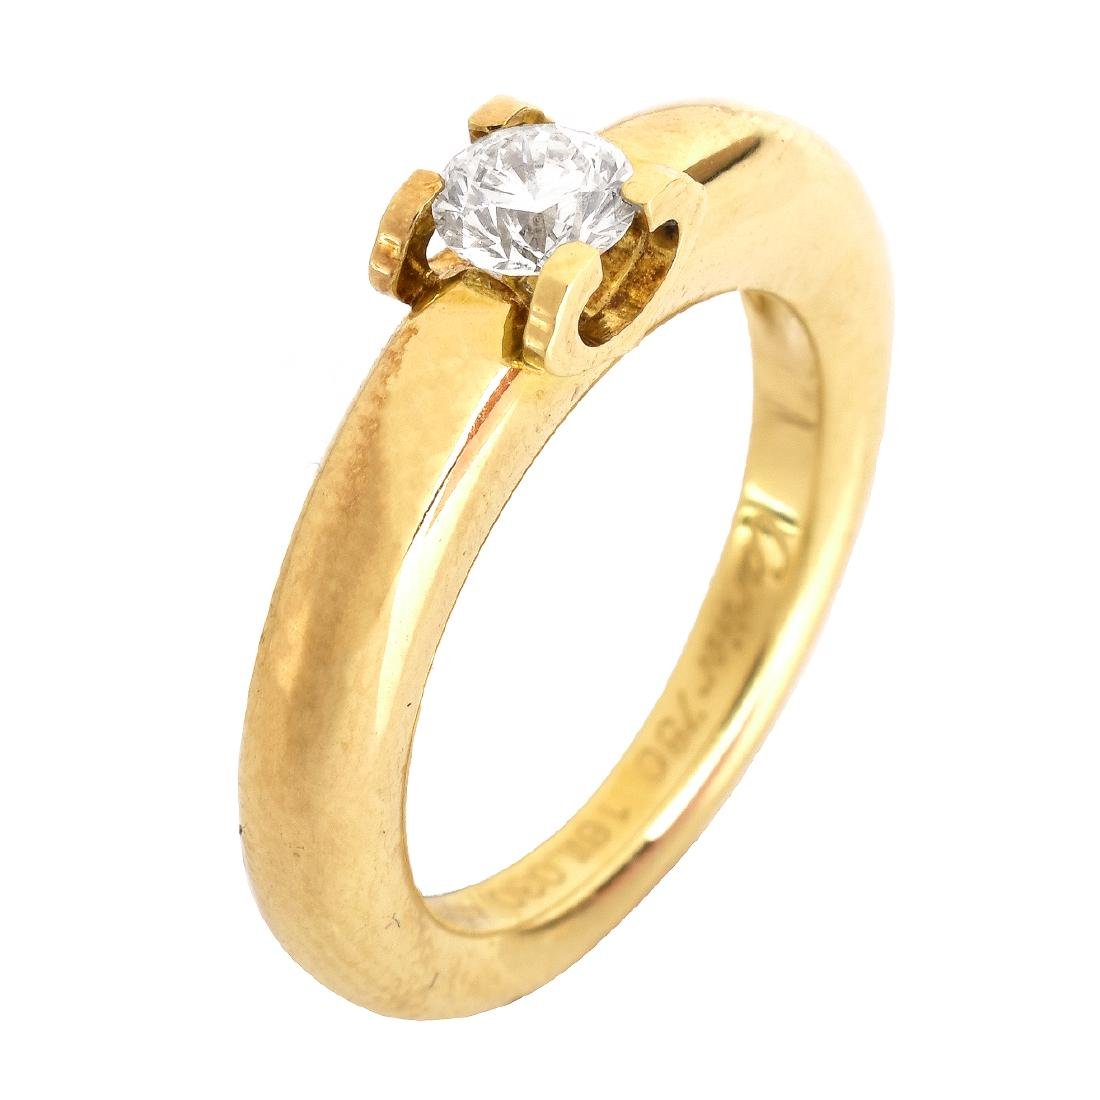 Cartier Louis Solitaire Ring